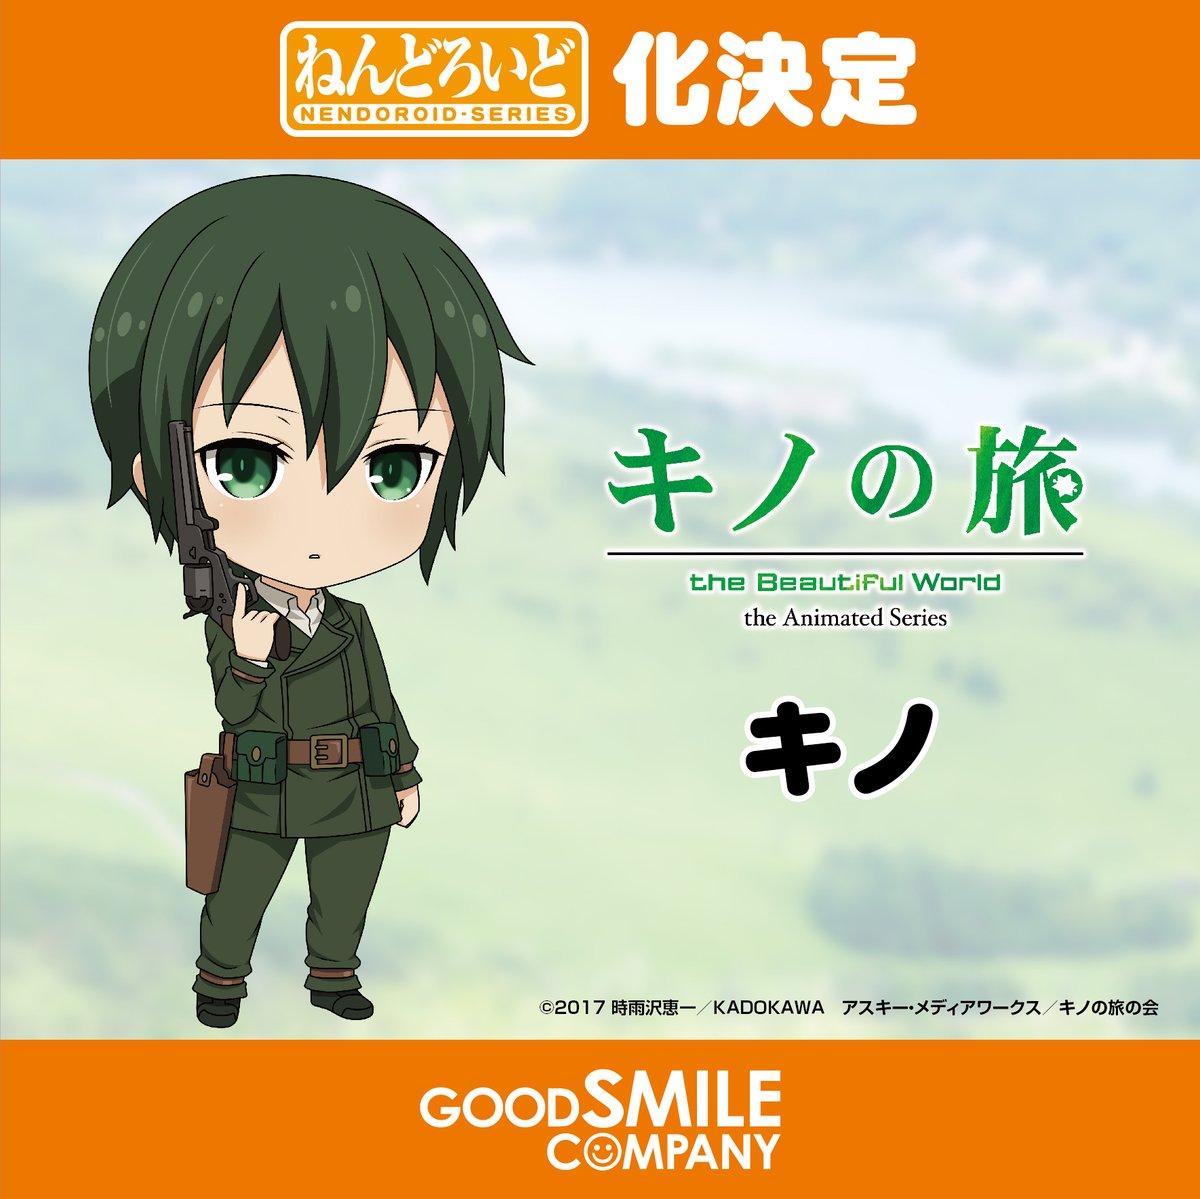 Link a Nendoroid Kino announce